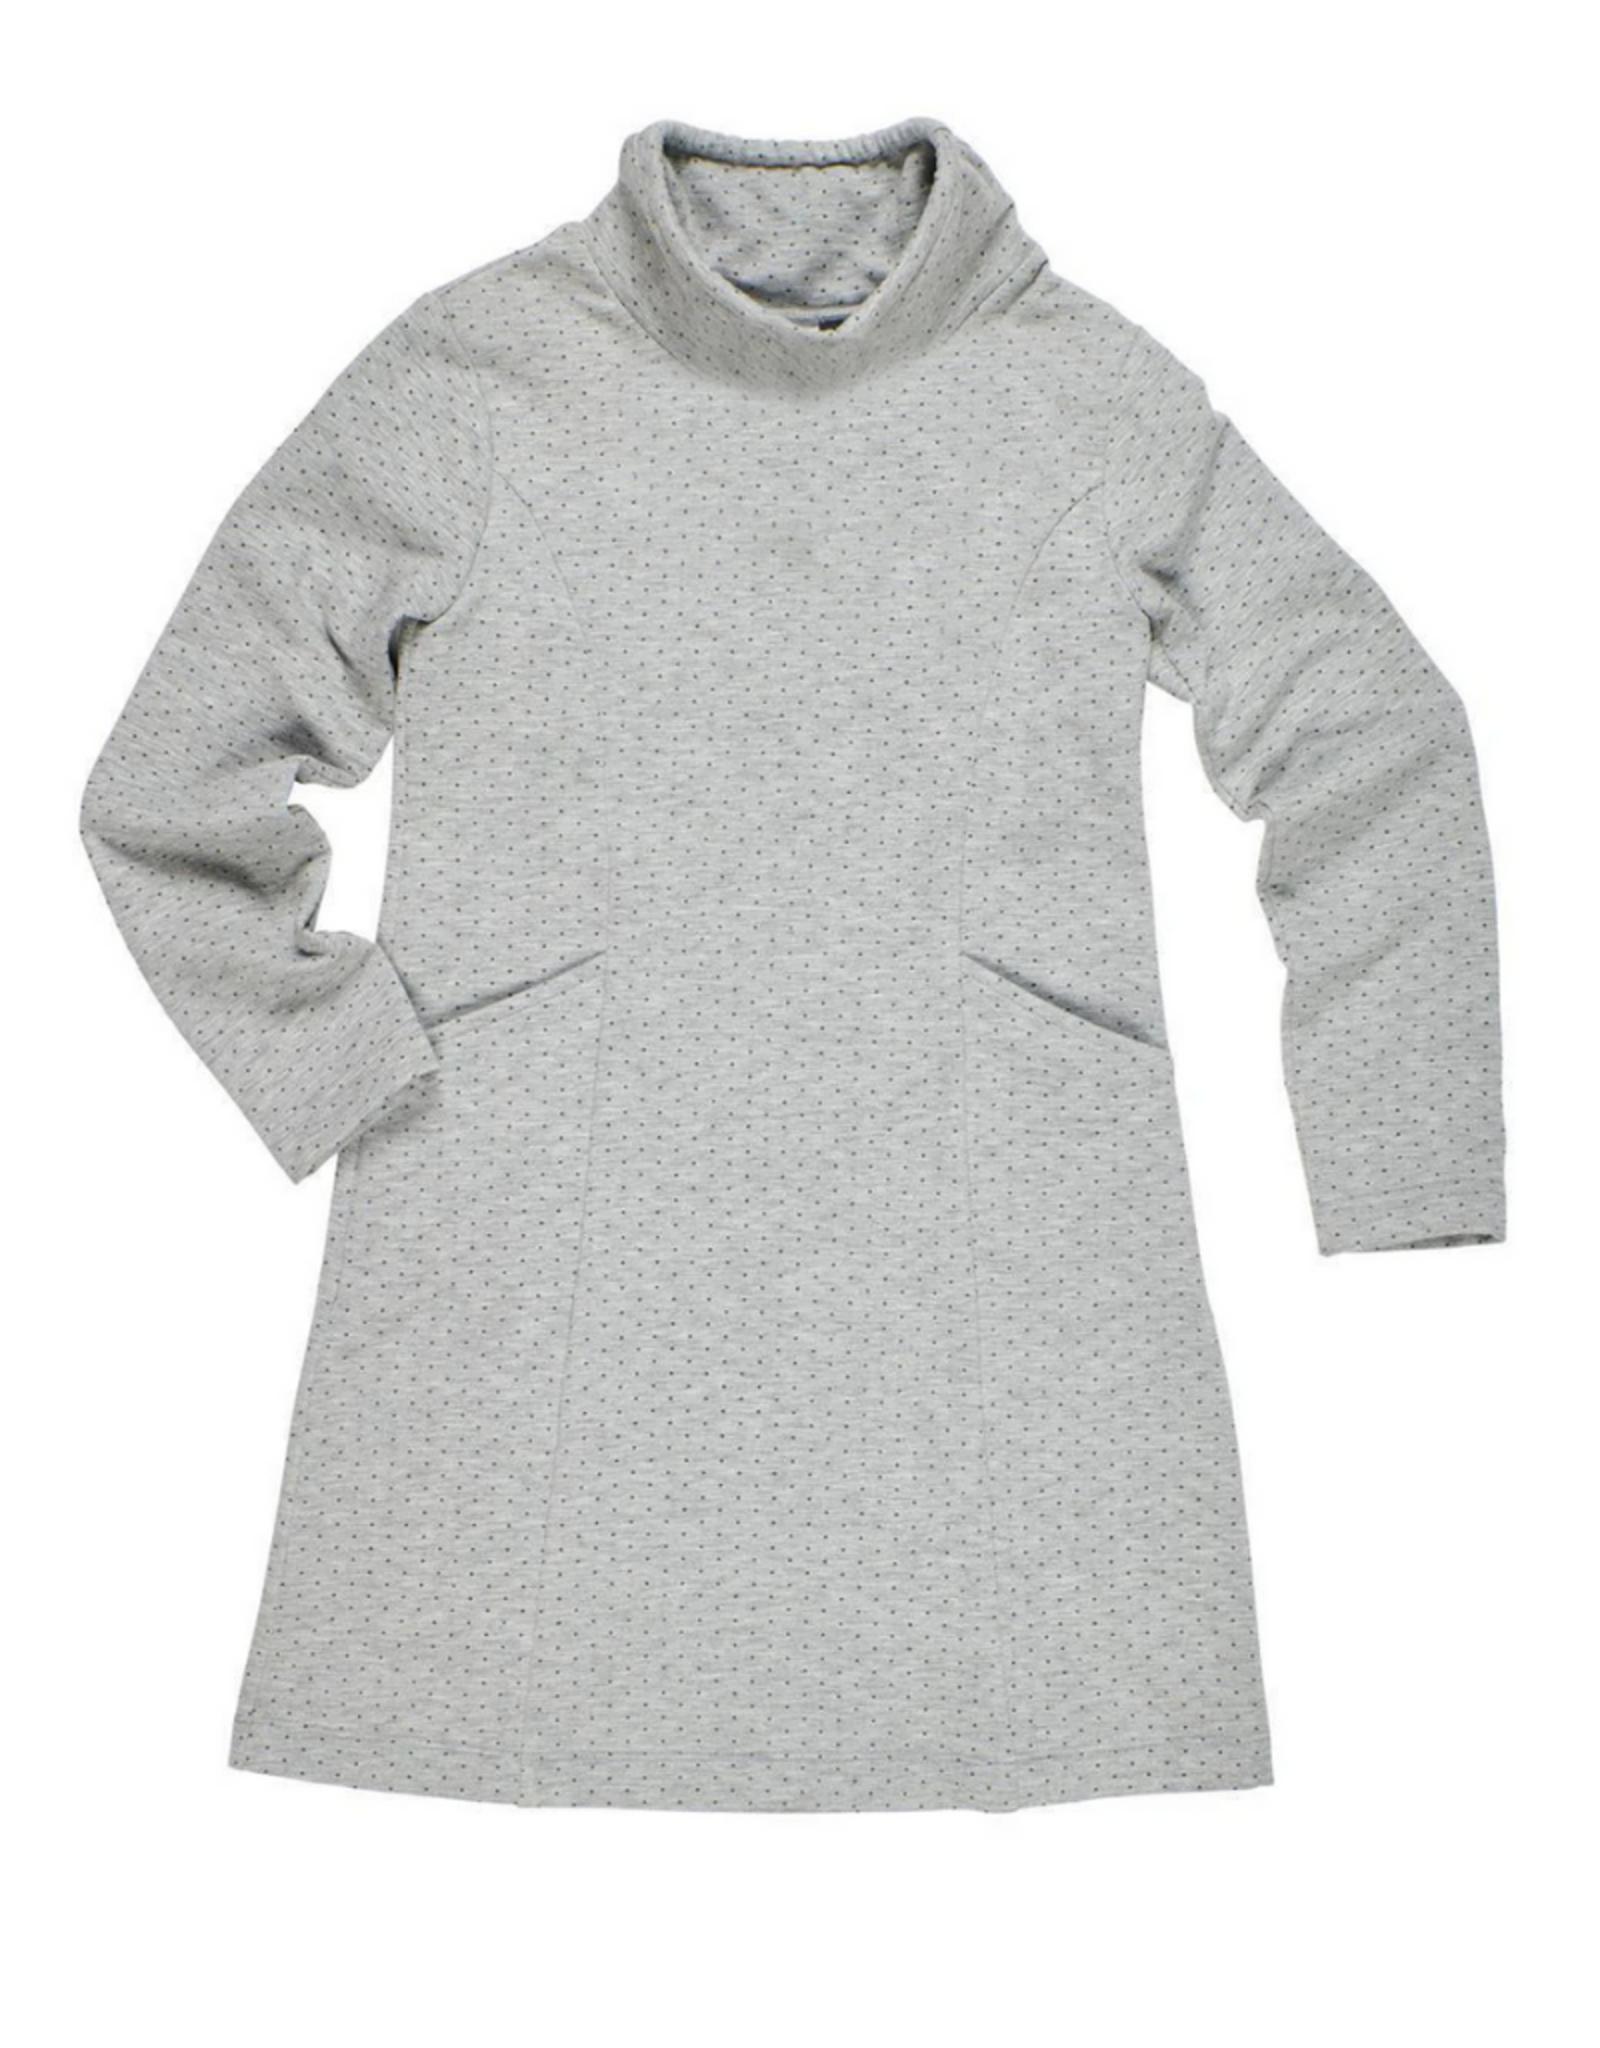 Florence Eiseman Polka Dot Sweatshirt Dress With Pockets